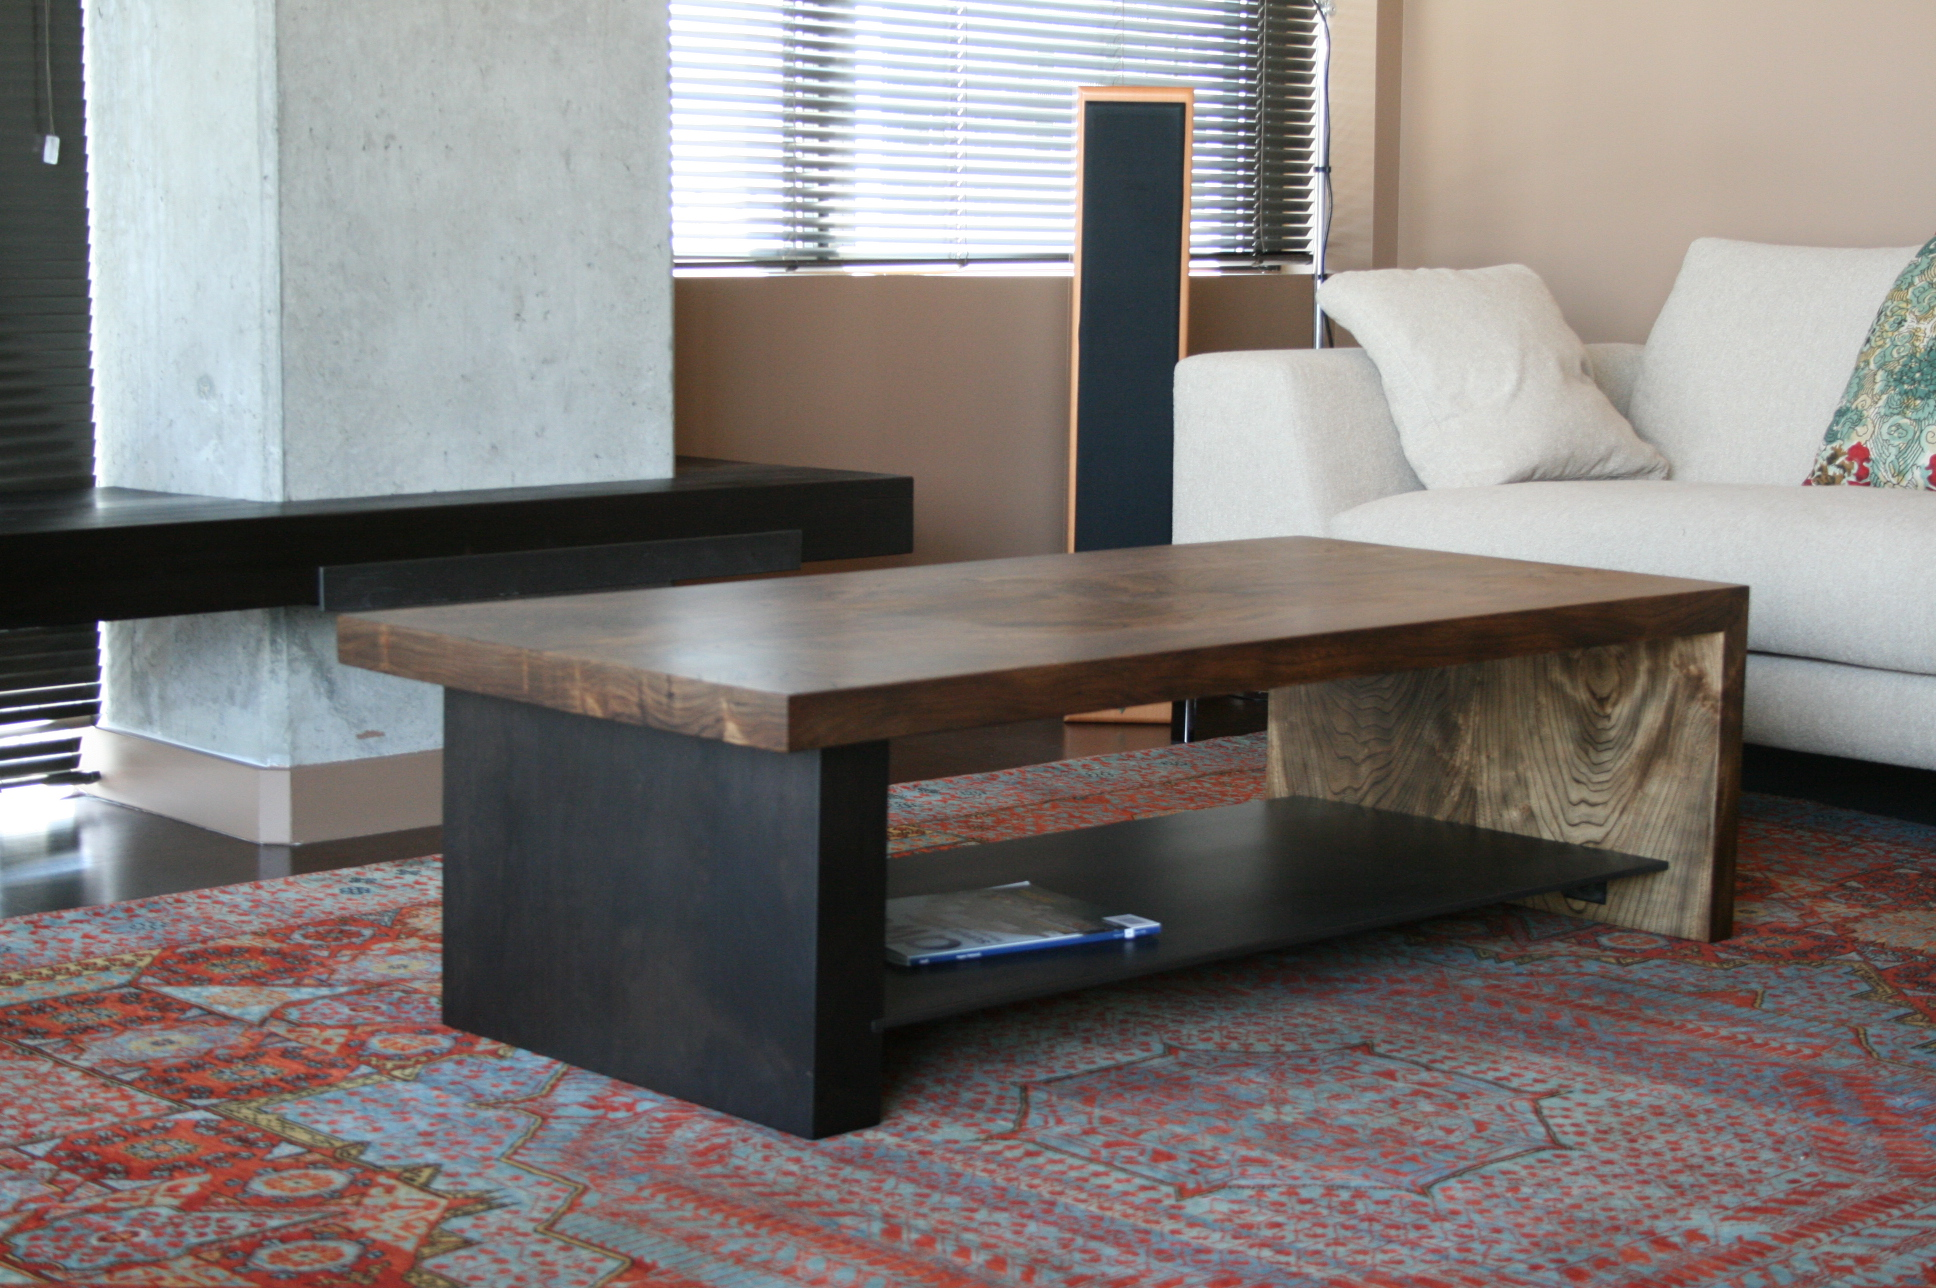 robbins table